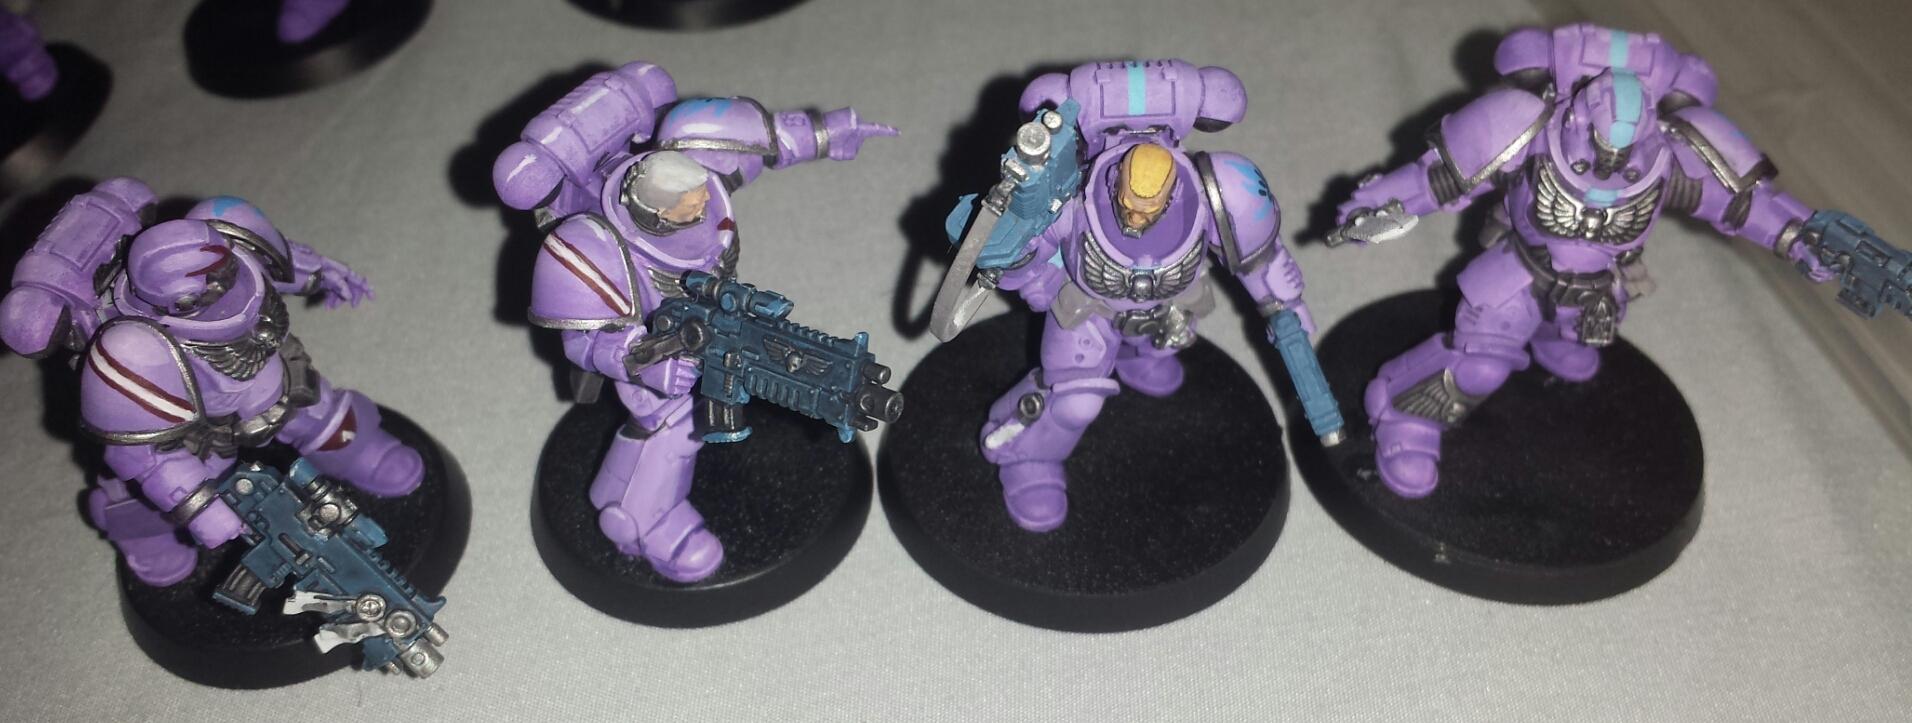 The mini blasters - 1 10